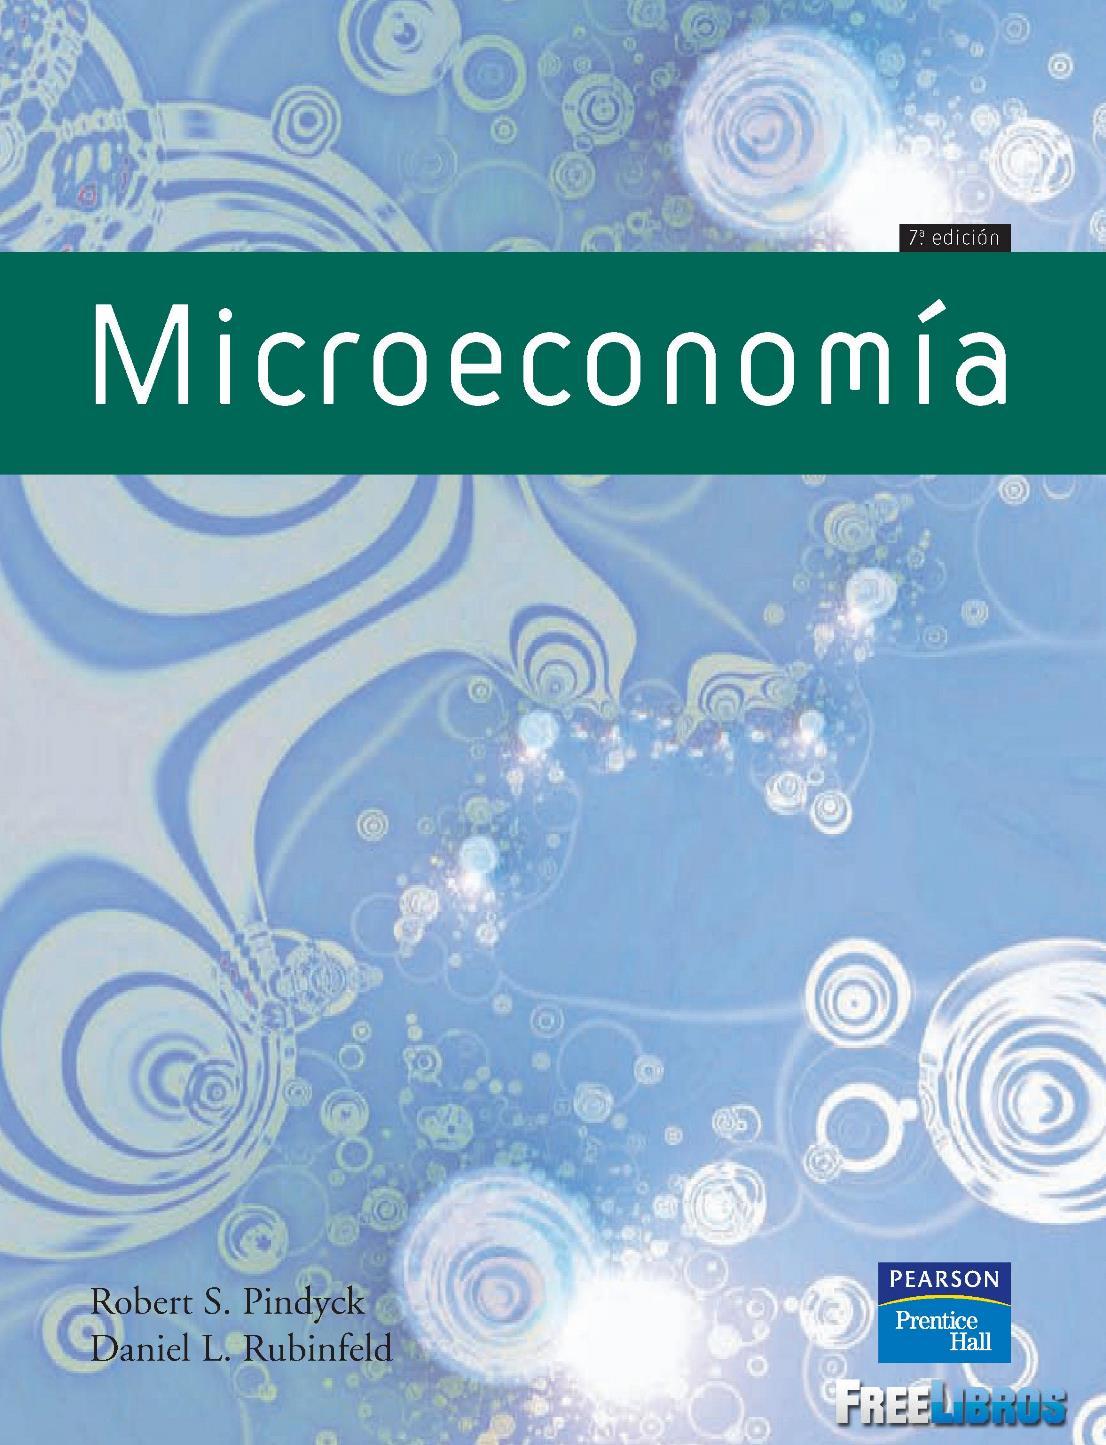 Microeconomia pindyck 7 edicion